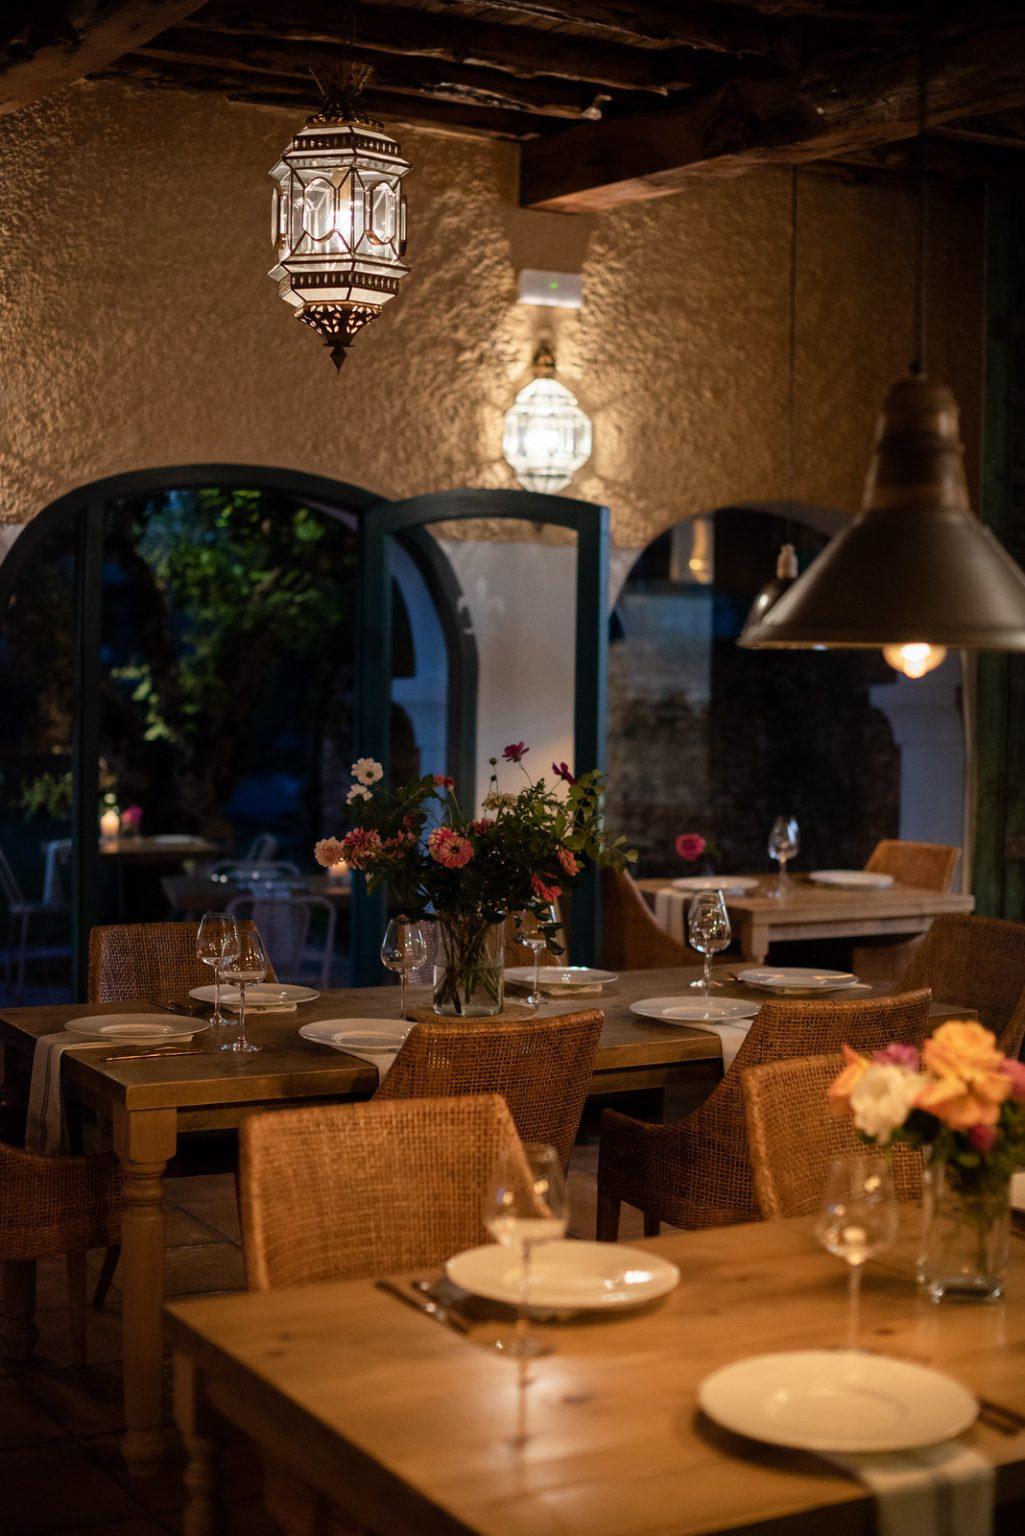 https://www.white-ibiza.com/wp-content/uploads/2020/11/cas-gasi-restaurant-2020-14-1025x1536.jpg